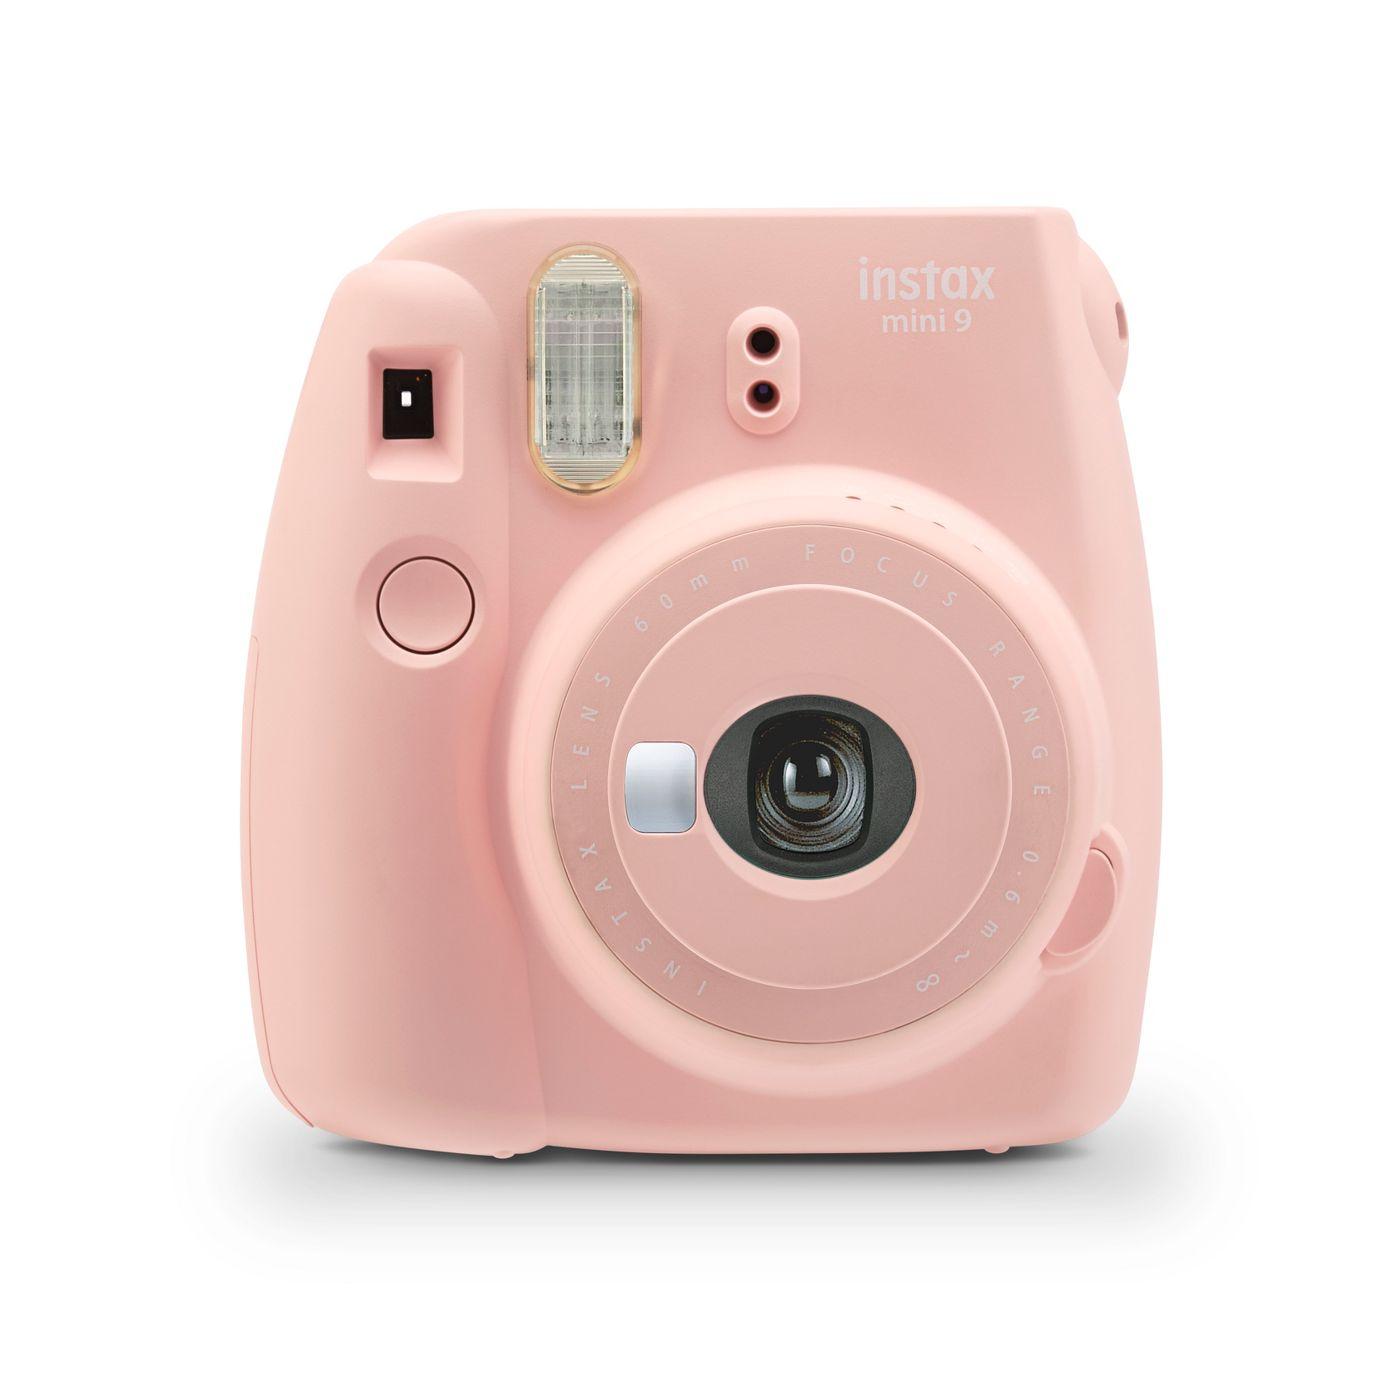 Fujifilm Instax Mini 9 Camera - image 1 of 6